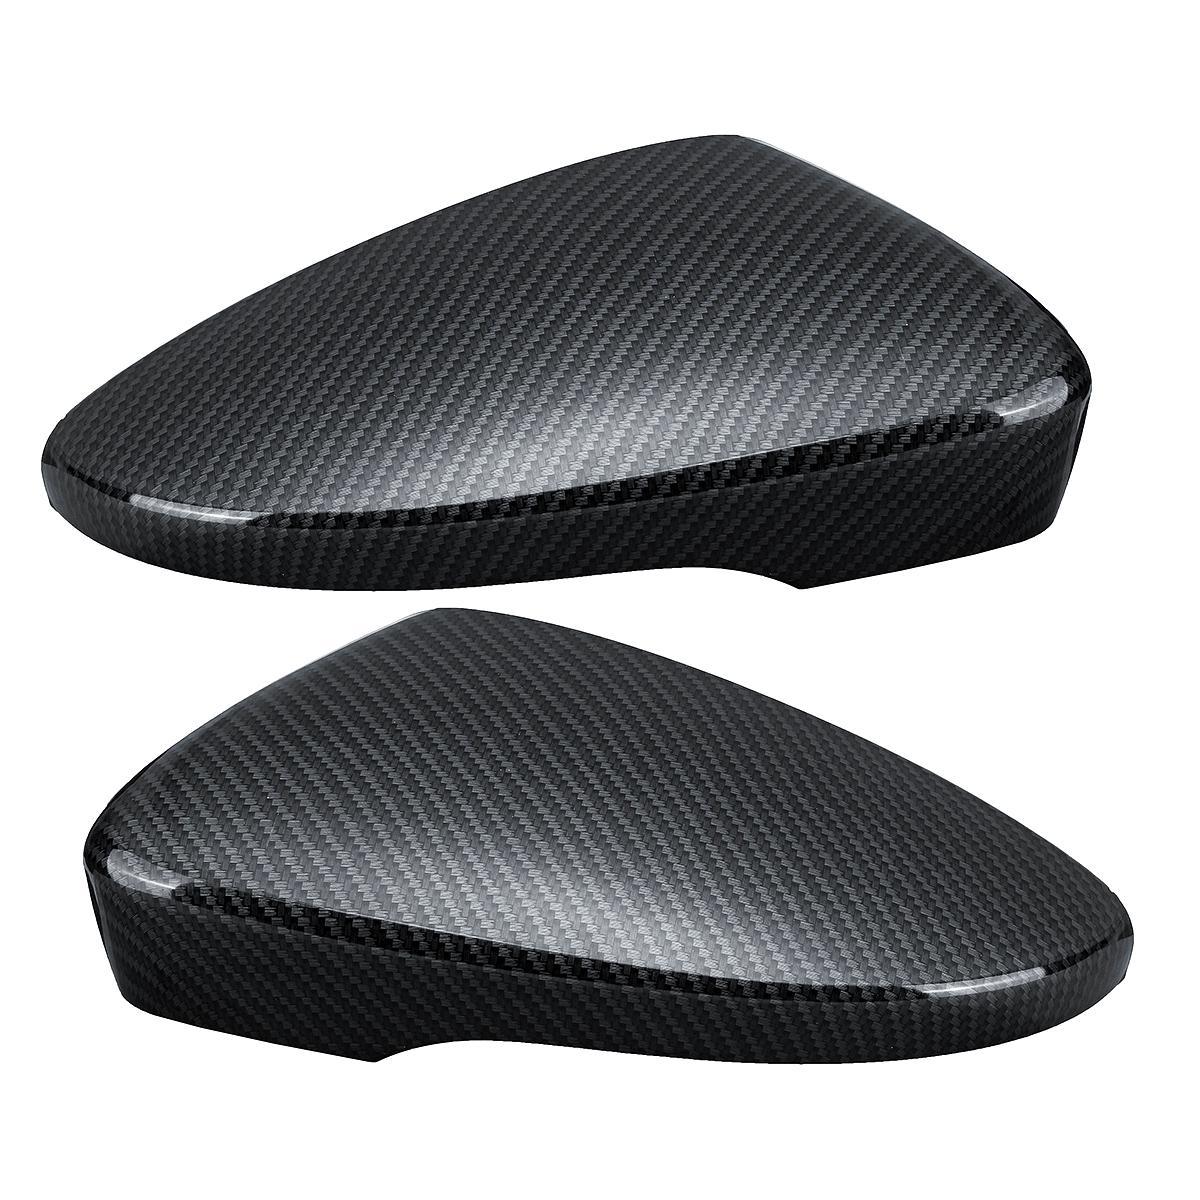 Car Door Wing Rearview Mirror Cover Carbon Black Pair for VW Passat Scirocco Beetle CC Eos